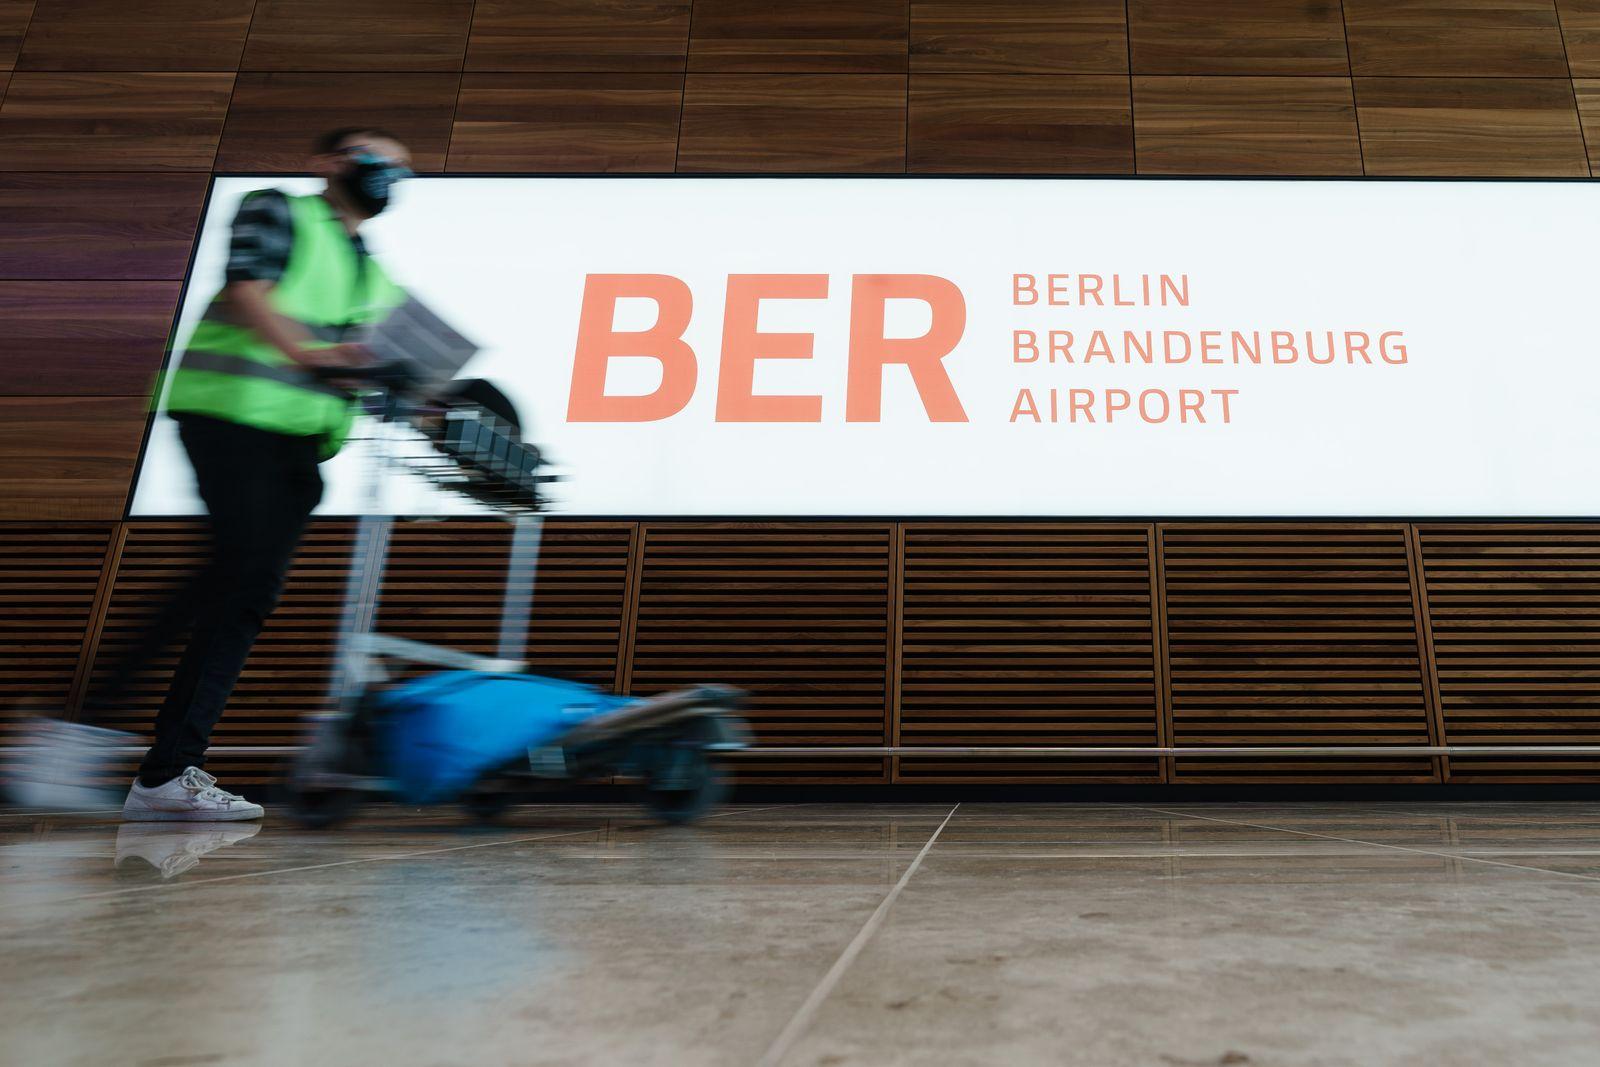 Berlin Brandenburg Airport press tour in Germany, Schoenefeld - 03 Sep 2020